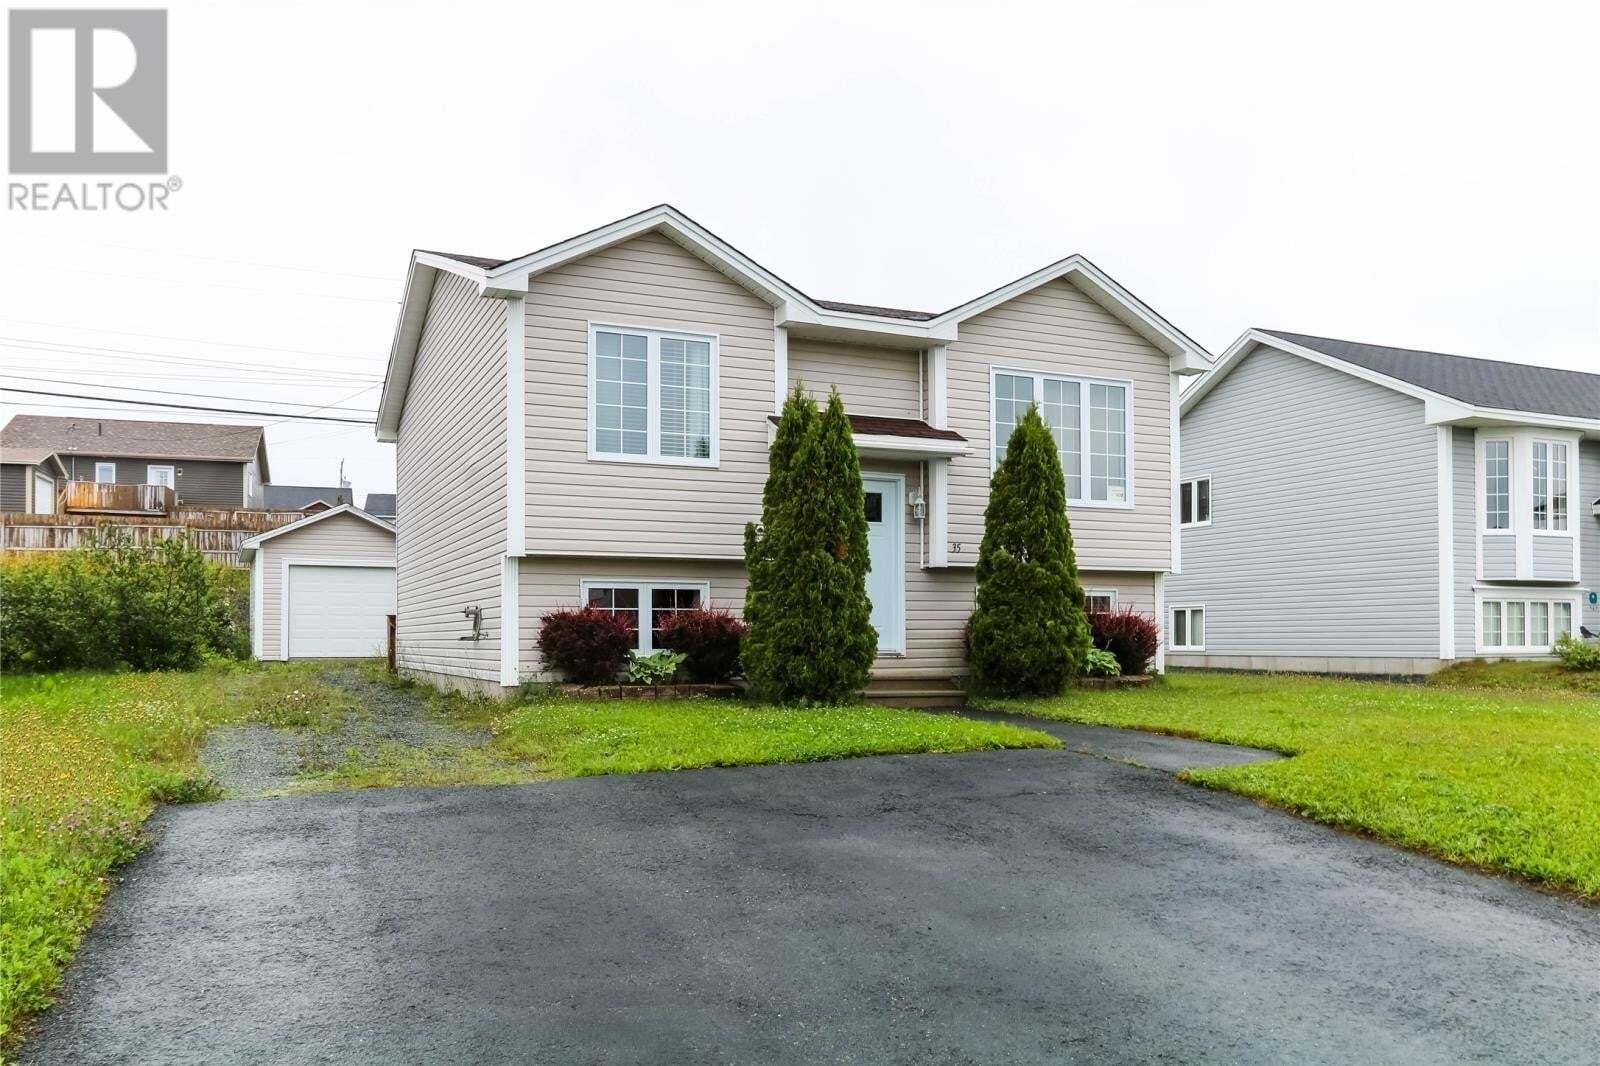 House for sale at 35 Lanark Dr Paradise Newfoundland - MLS: 1217056